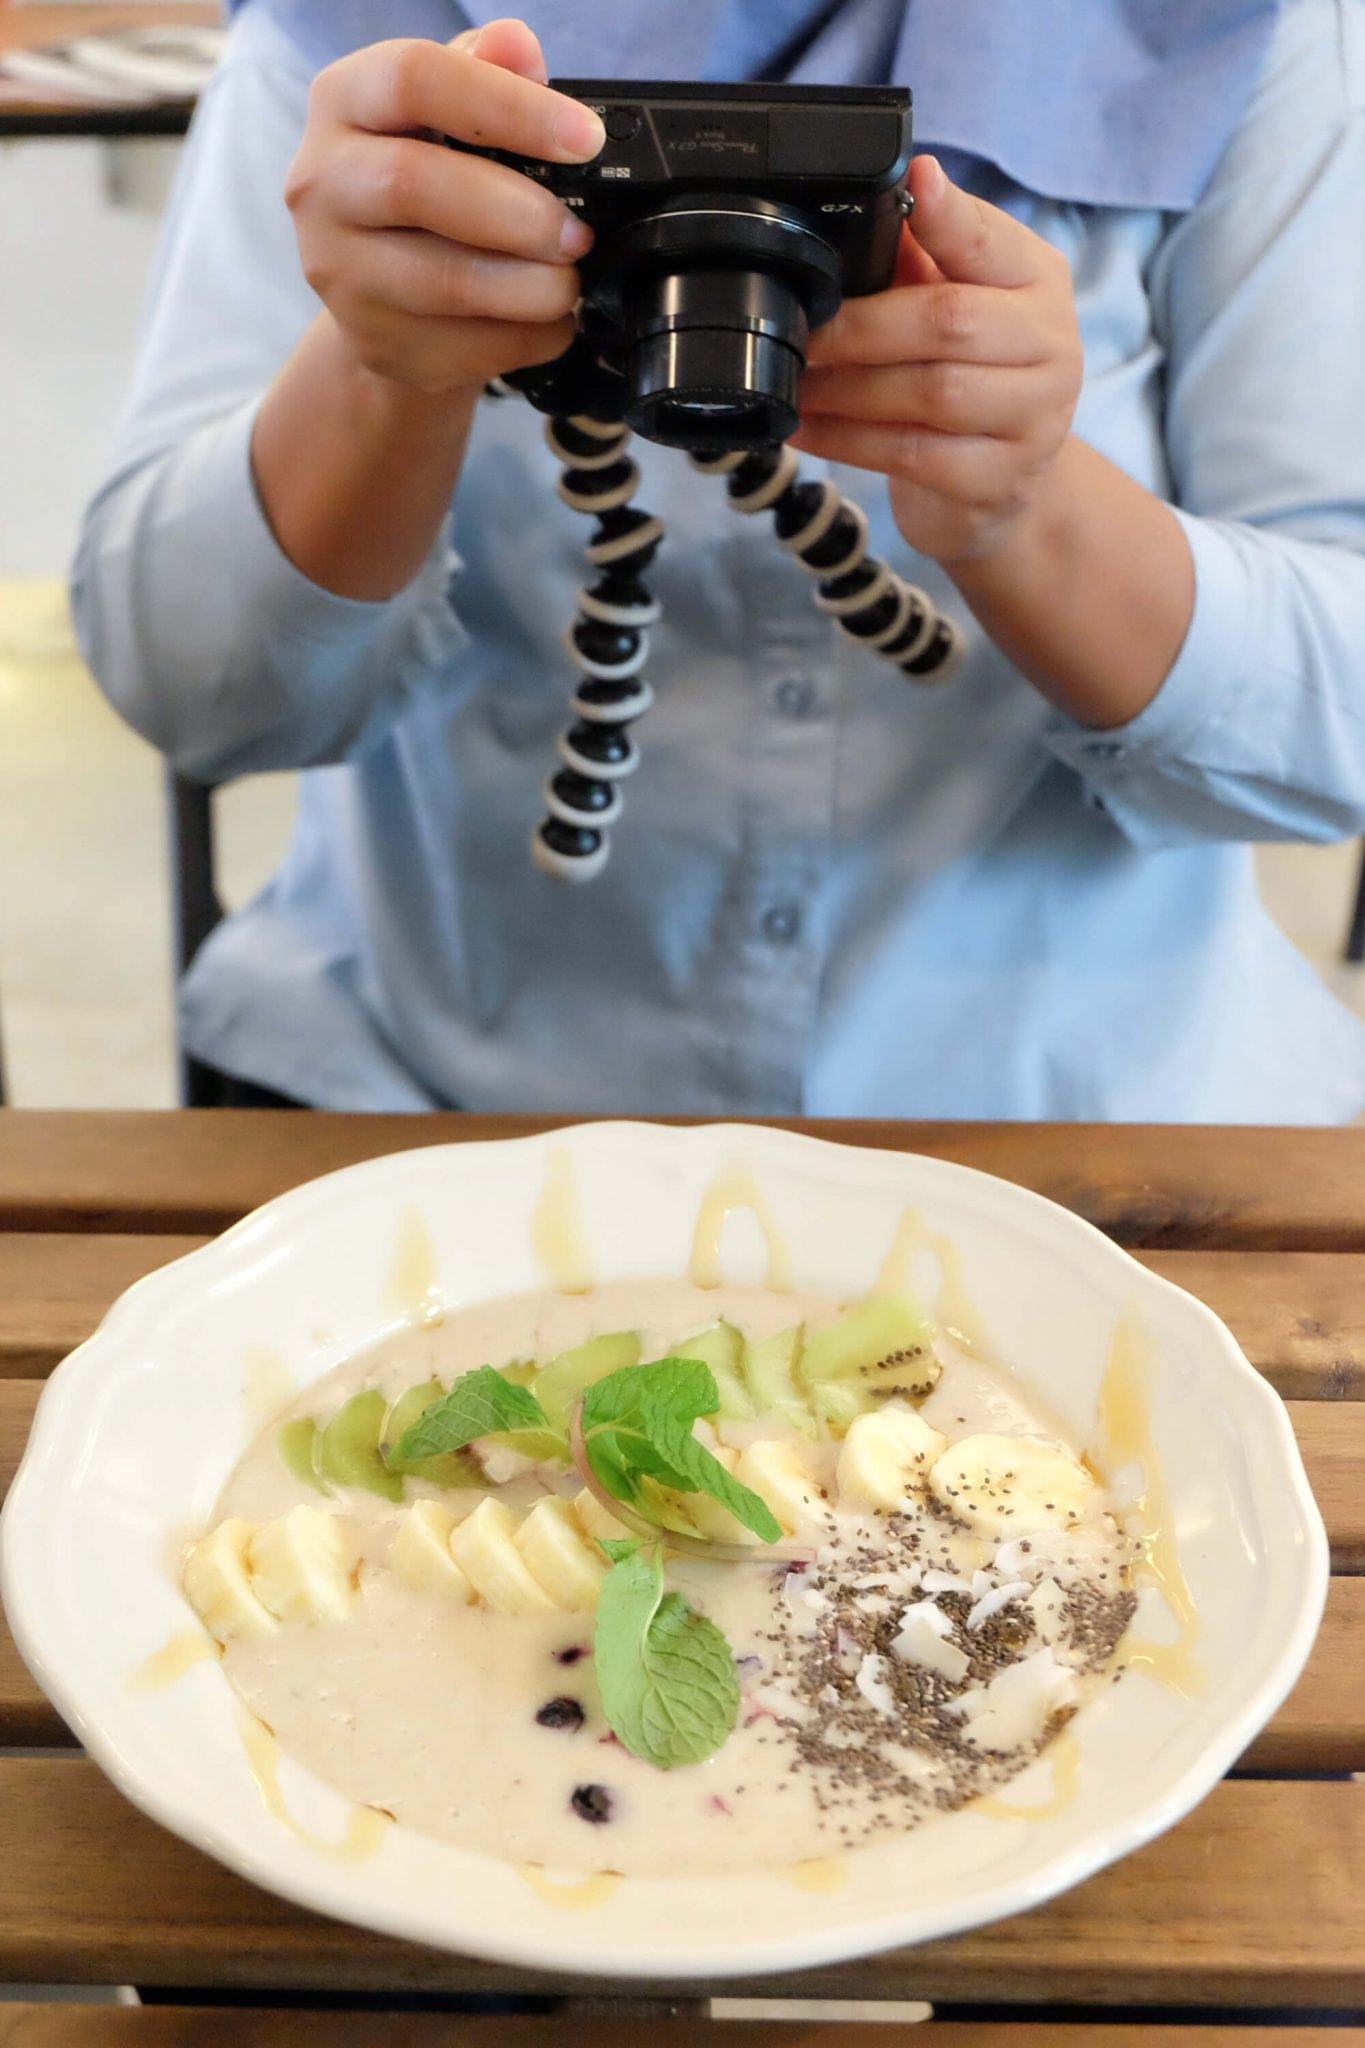 Ceritanya sarapan sehat : Super Bowl (mango + yoghurt + oats base, frozen berries, banana, coconut flakes n chia seed) ❤️